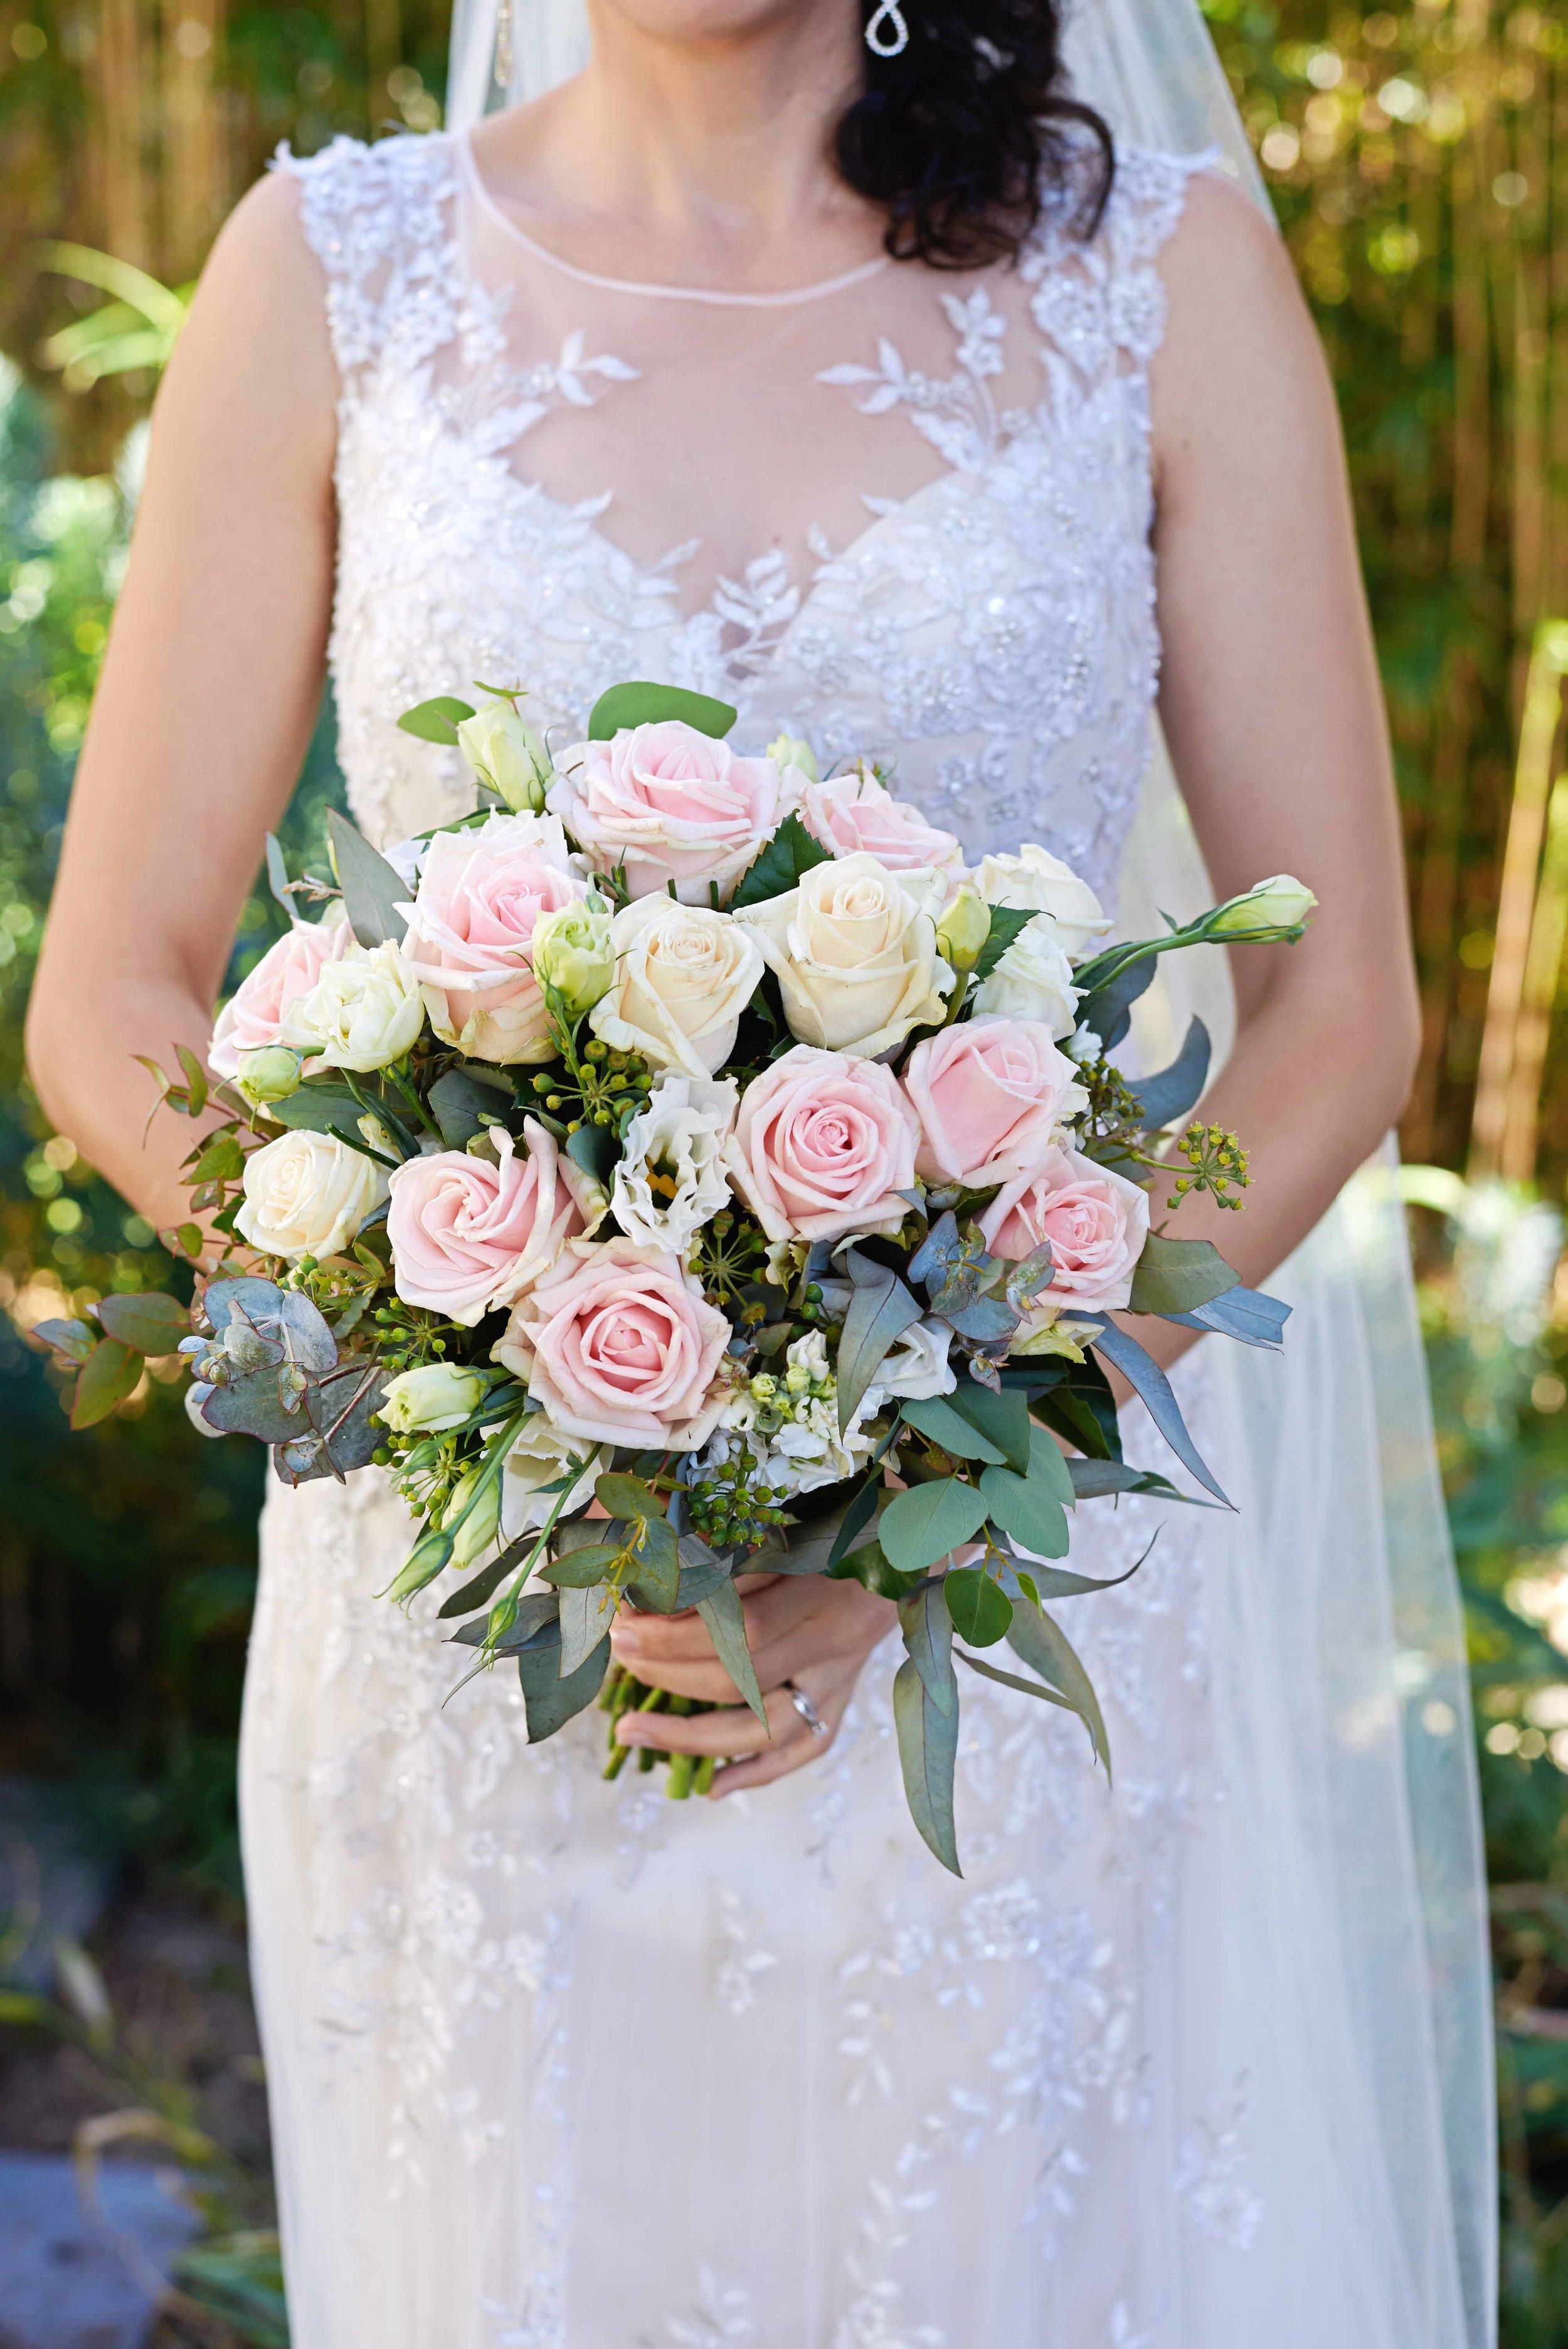 sorrento-wedding-photography-all-smiles-marissa-jade-photography-29.jpg